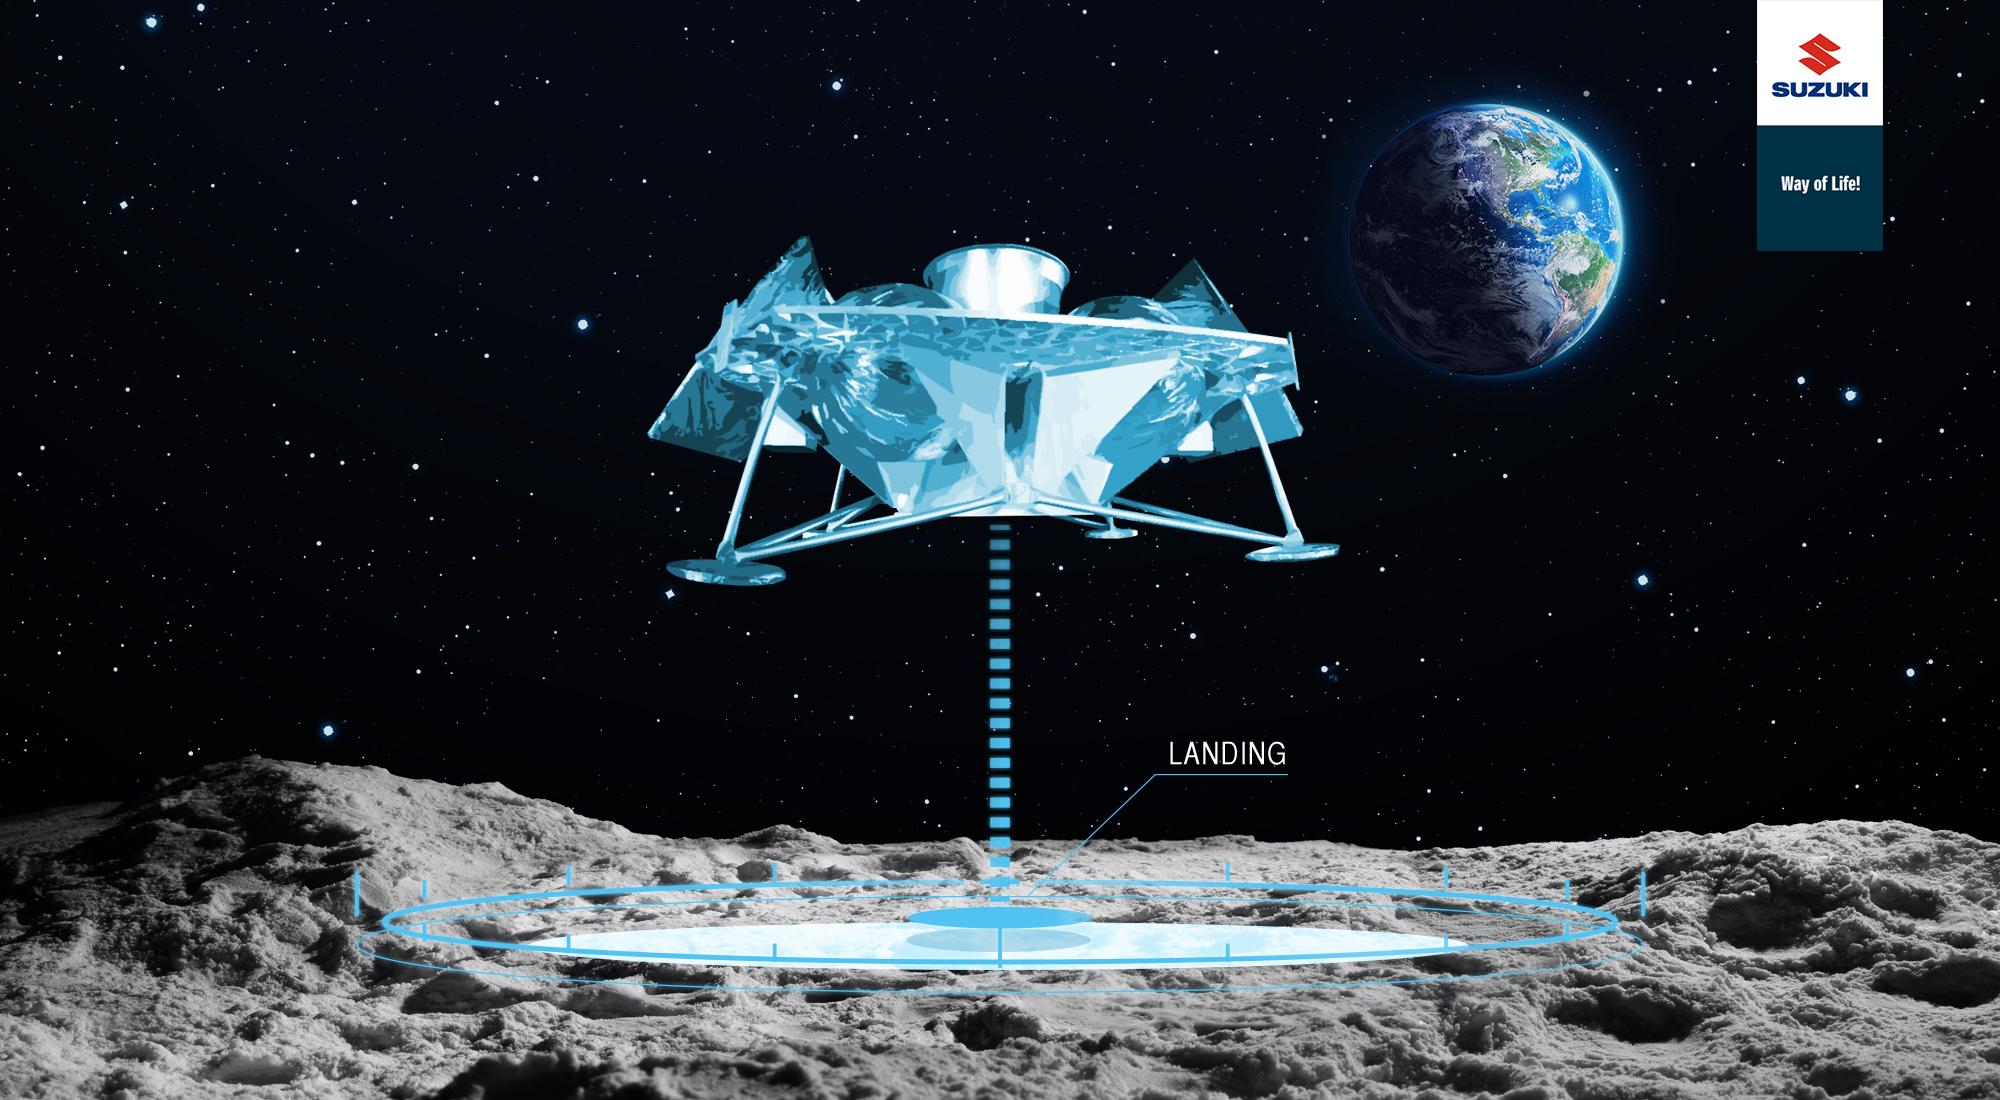 suzuki_missioni-lunari-ispace-electric_motor_news_02